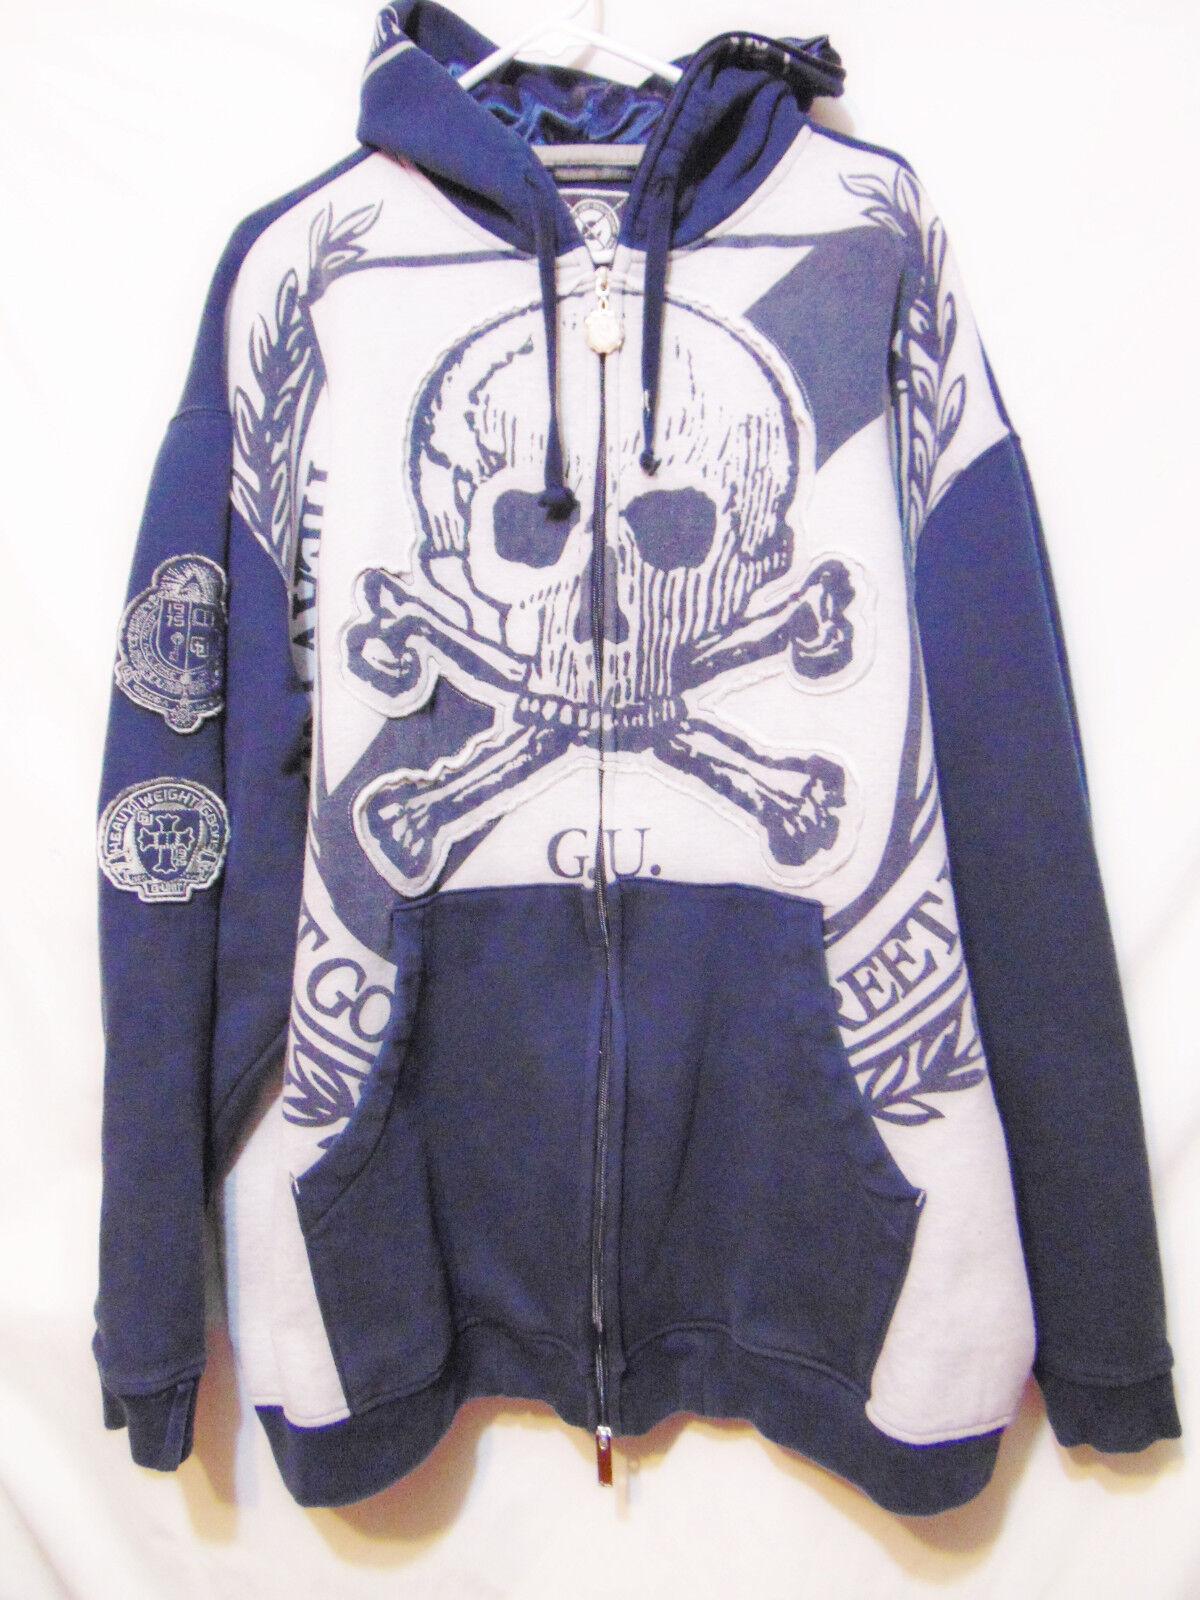 G UNIT Heavyweight Full Zip Front Hoodie 4XL Skull Hip Hop Rapper Rave Dist. 50